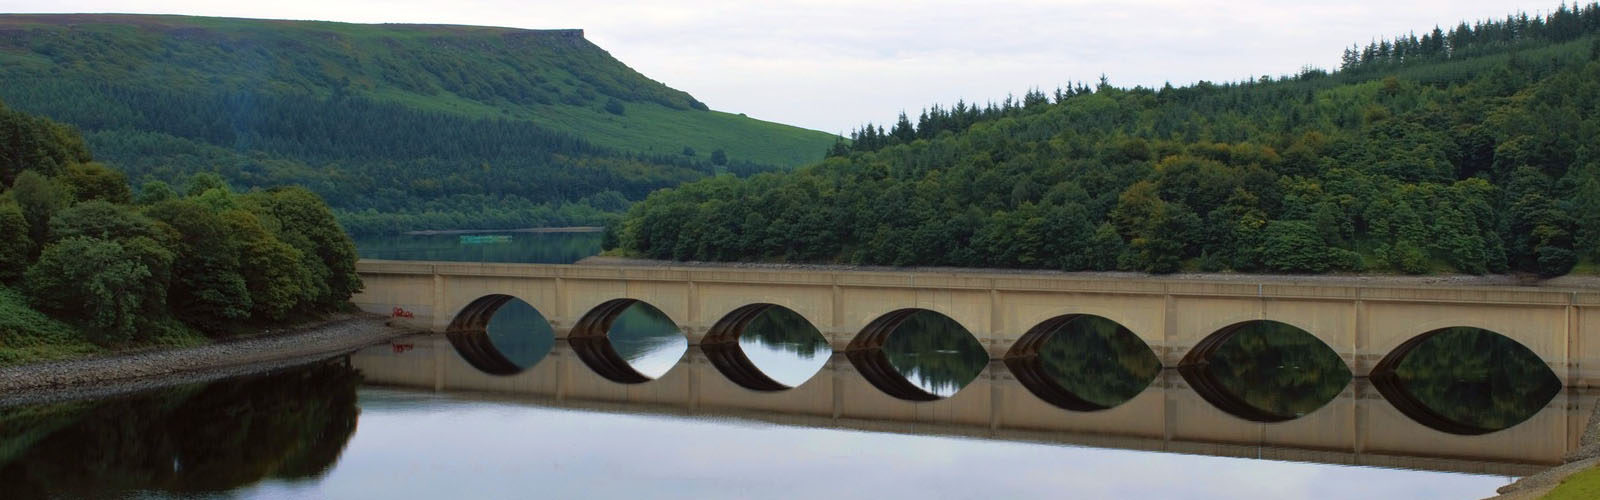 Reservoir Derbyshire Peak district.